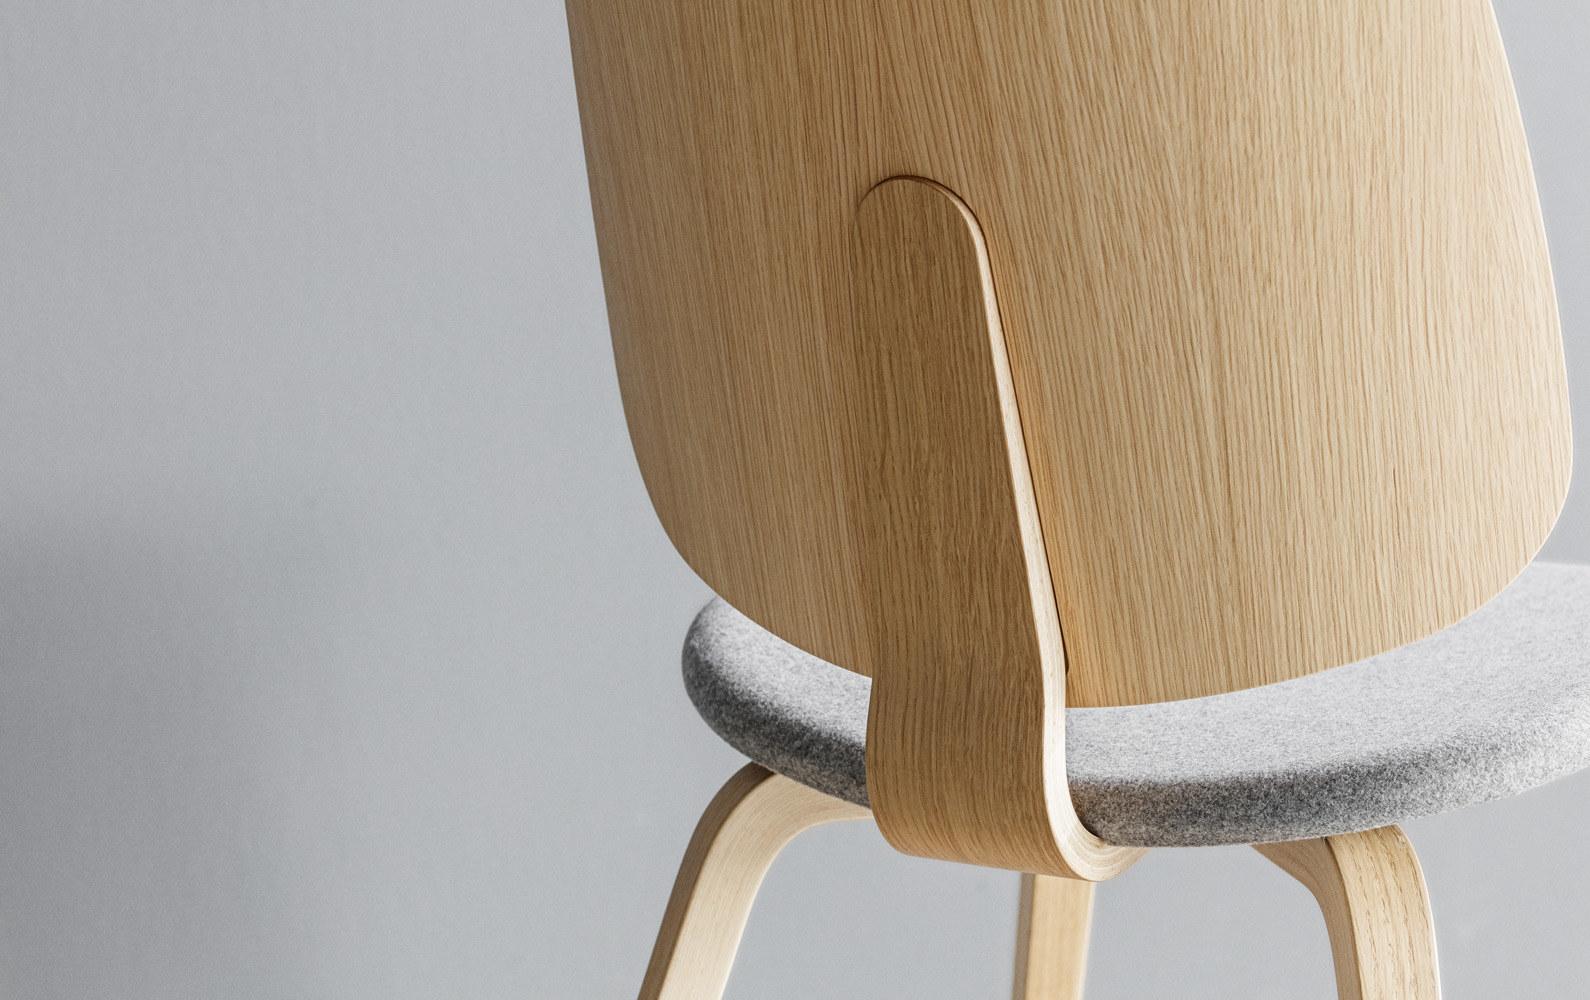 Monochrome - Aarhus chair